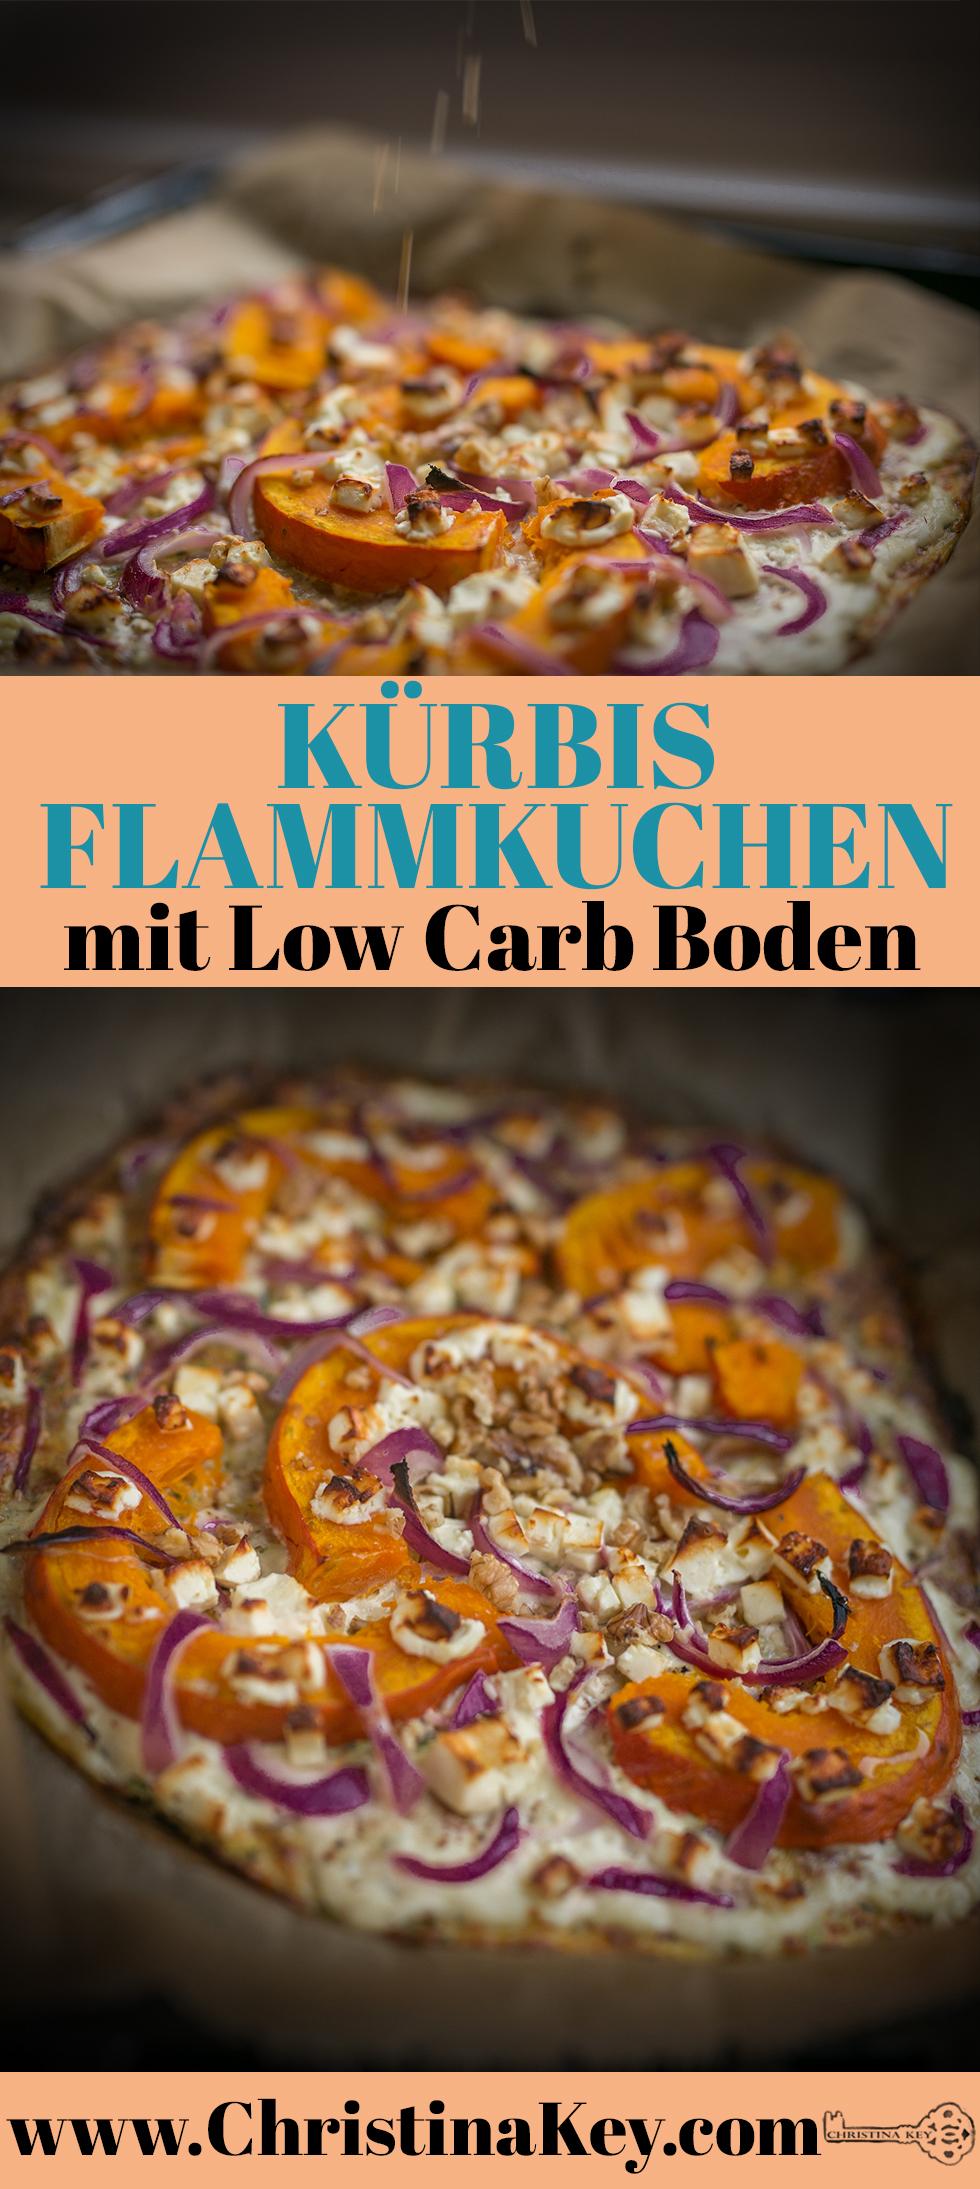 Kürbis Flammkuchen mit Low Carb Boden Rezept